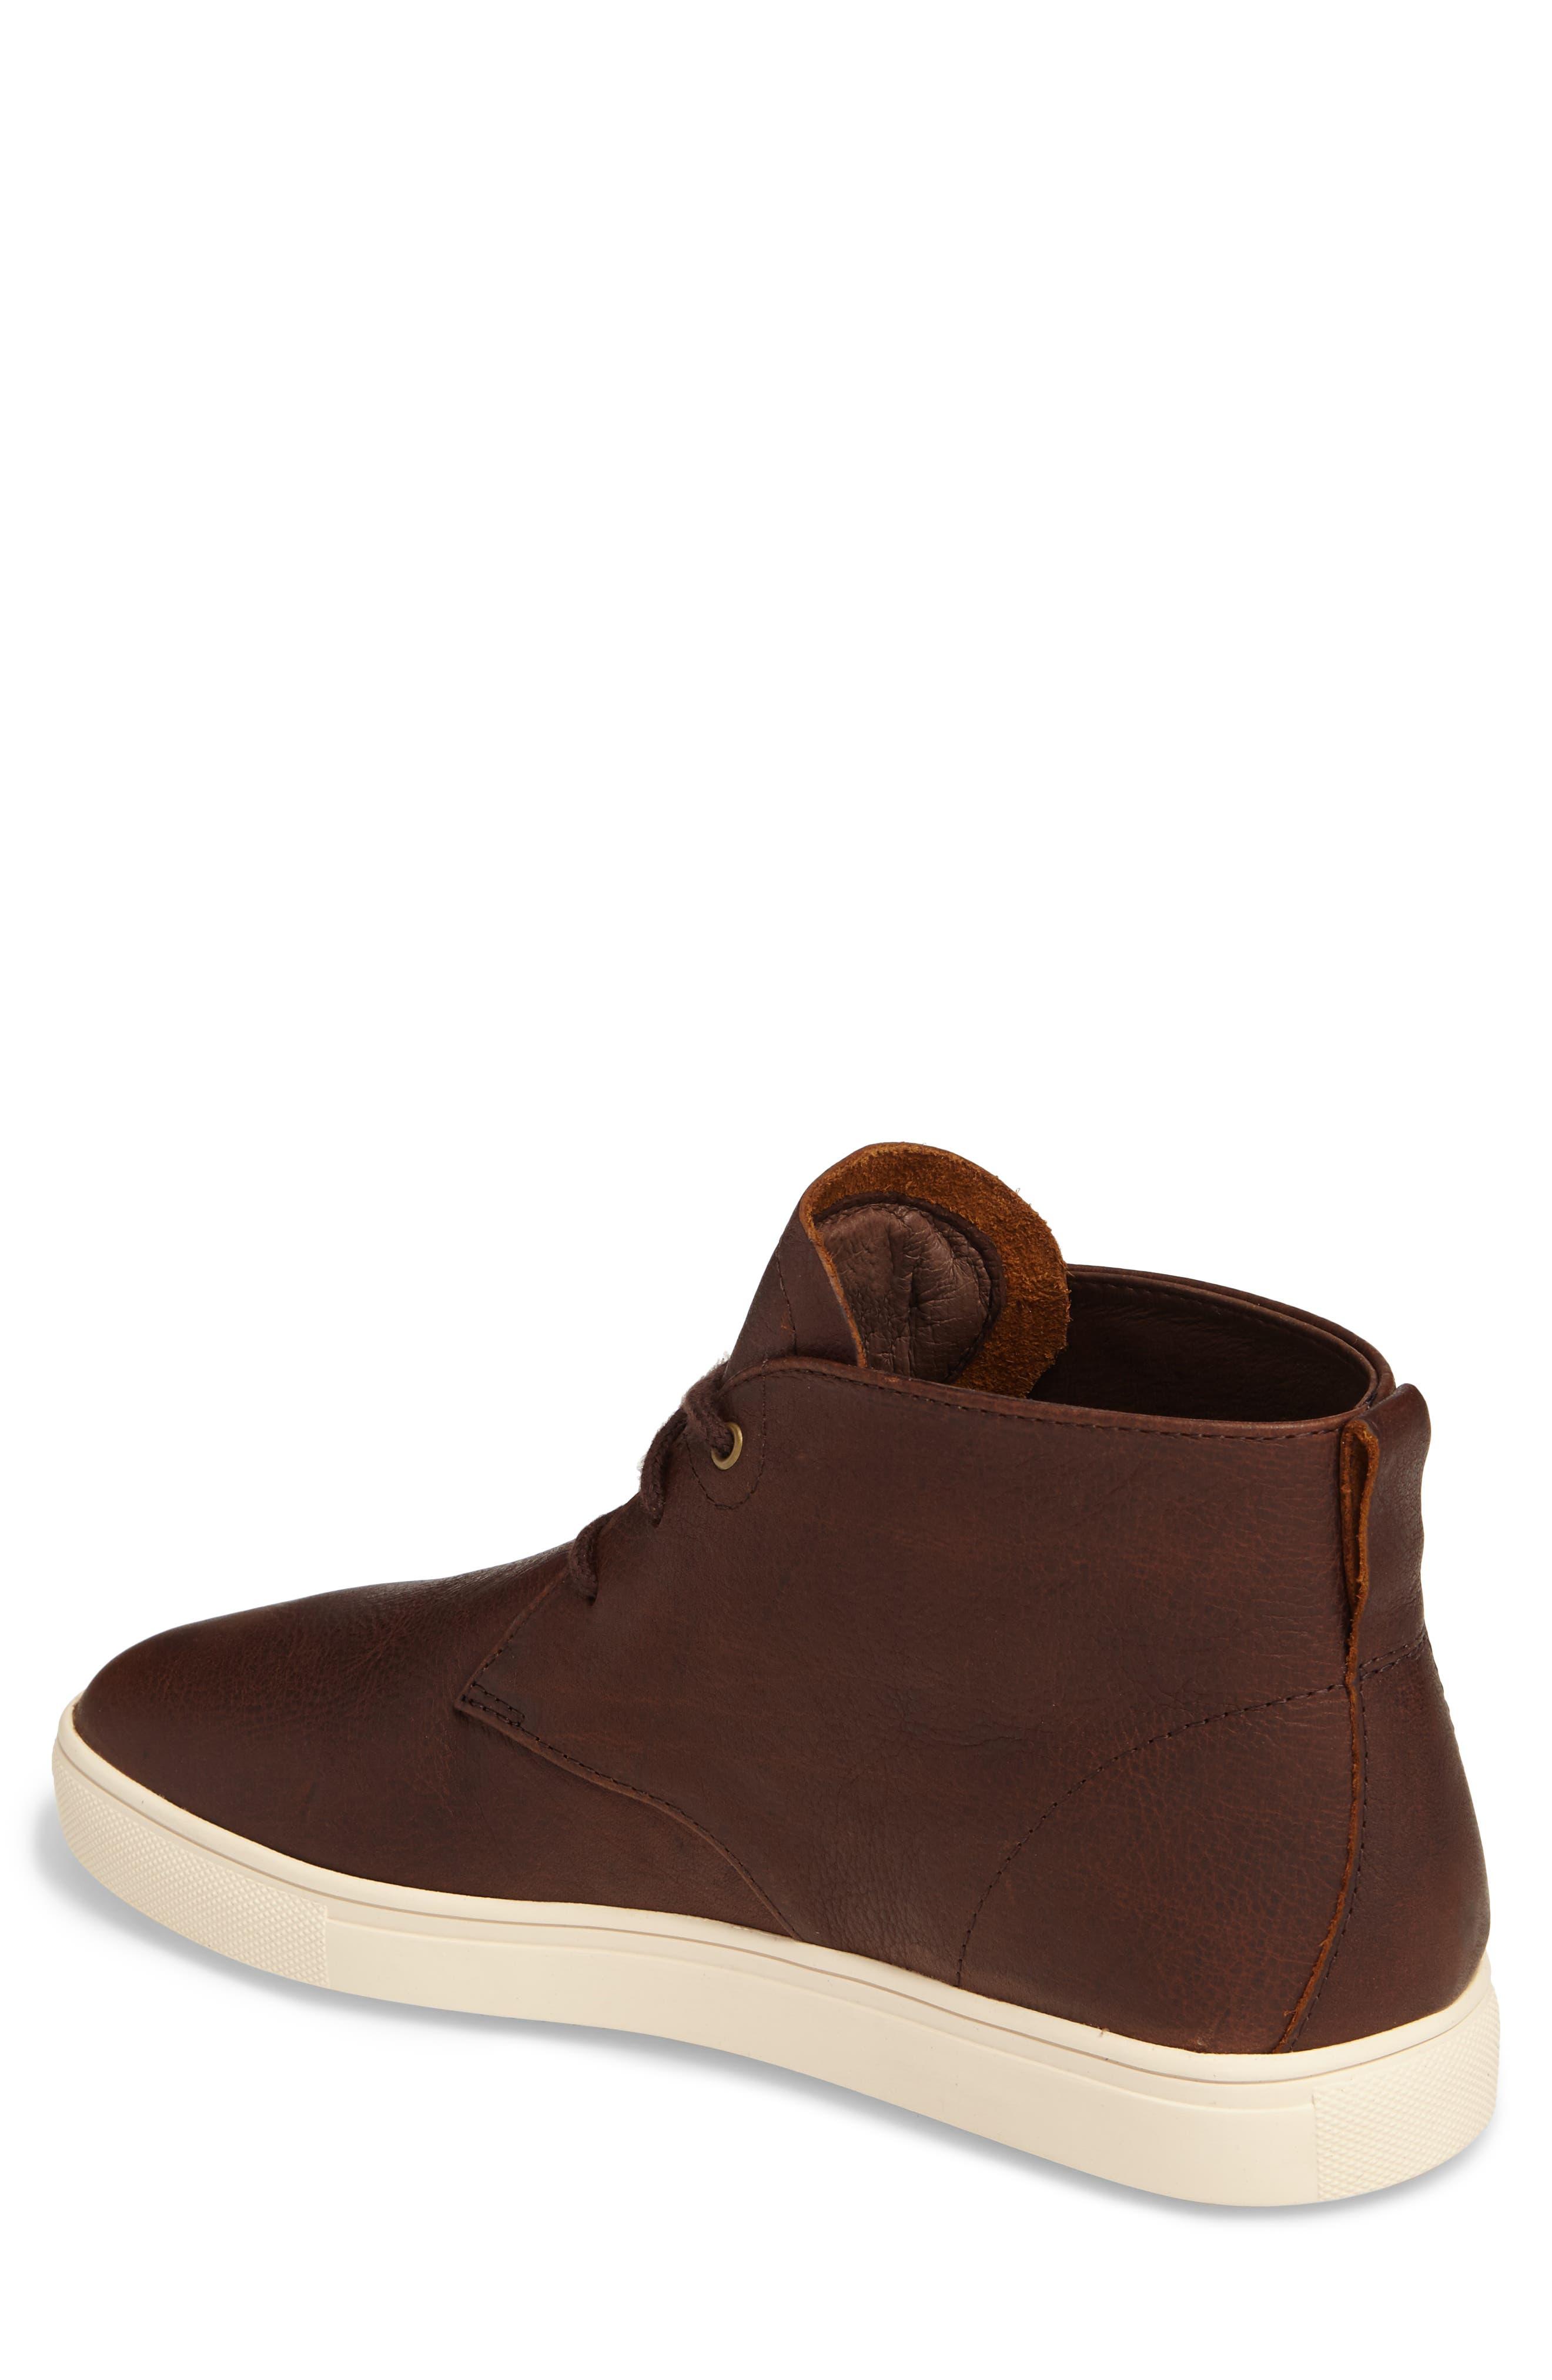 'Strayhorn SP' Chukka Boot,                             Alternate thumbnail 2, color,                             Cocoa Leather